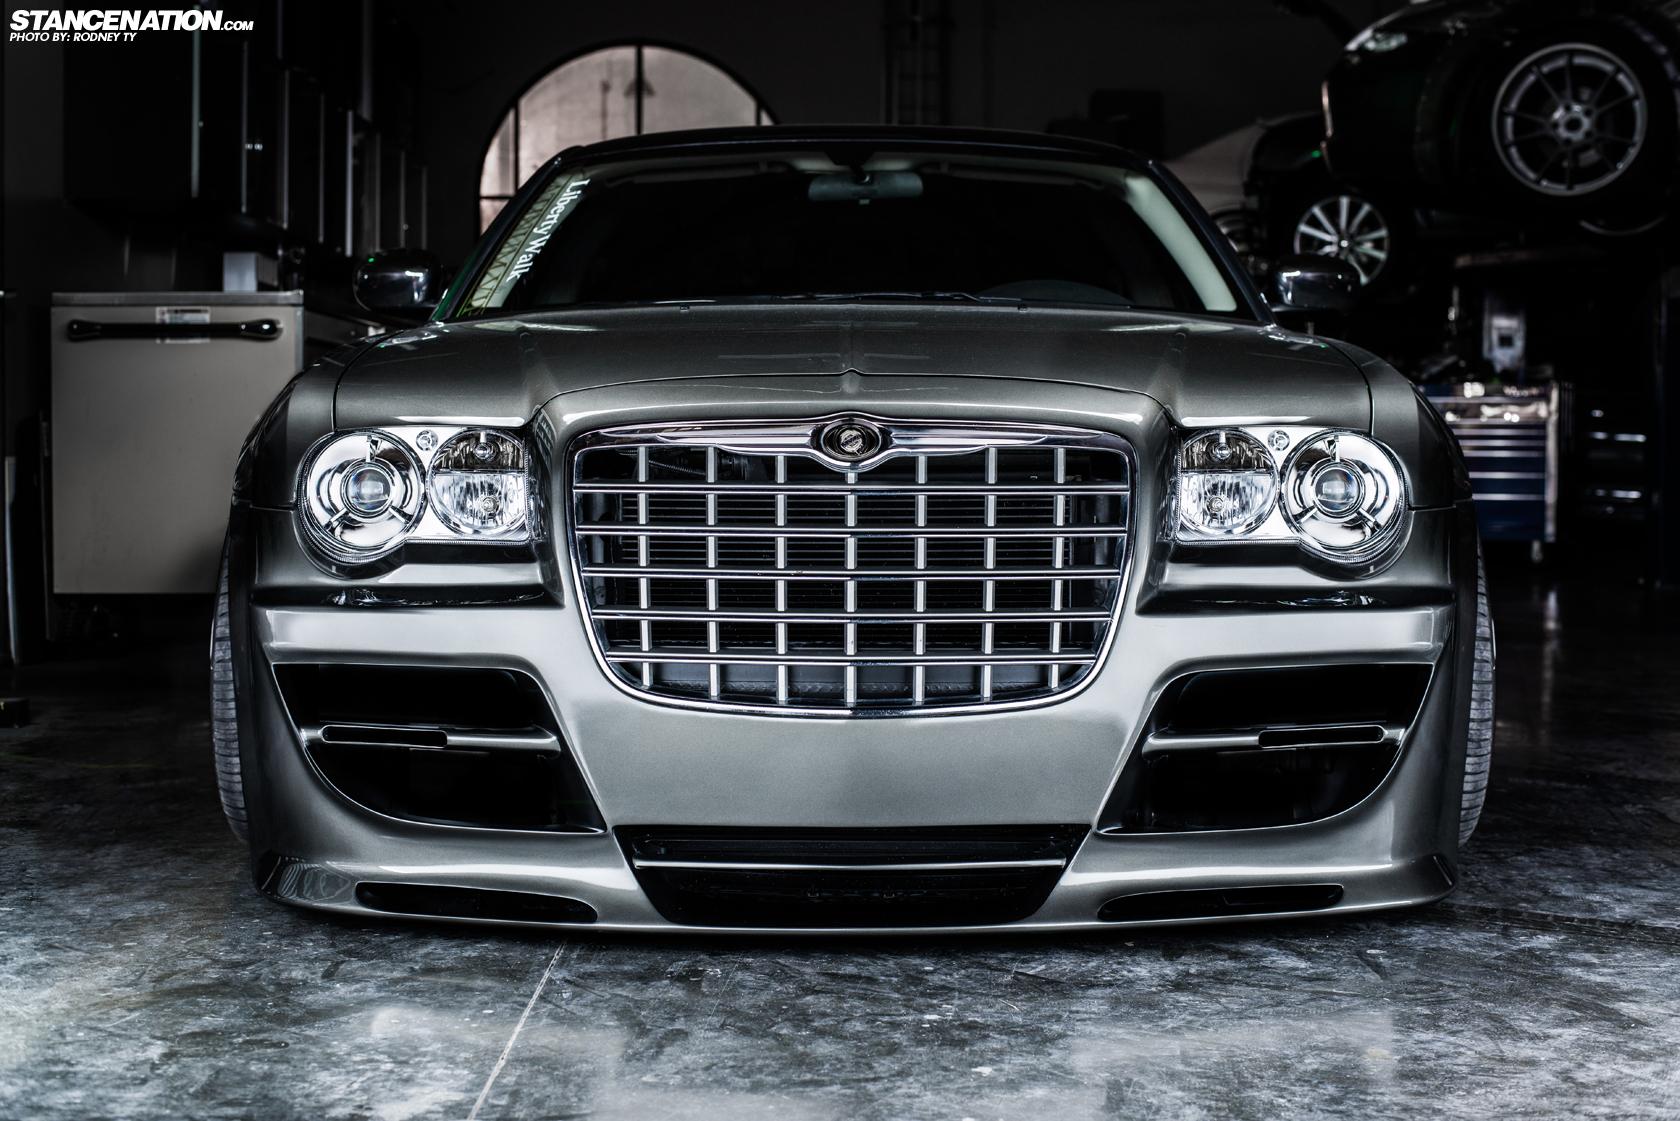 Platinum VIP x LIberty Walk Japan // Slammed Chrysler 300.